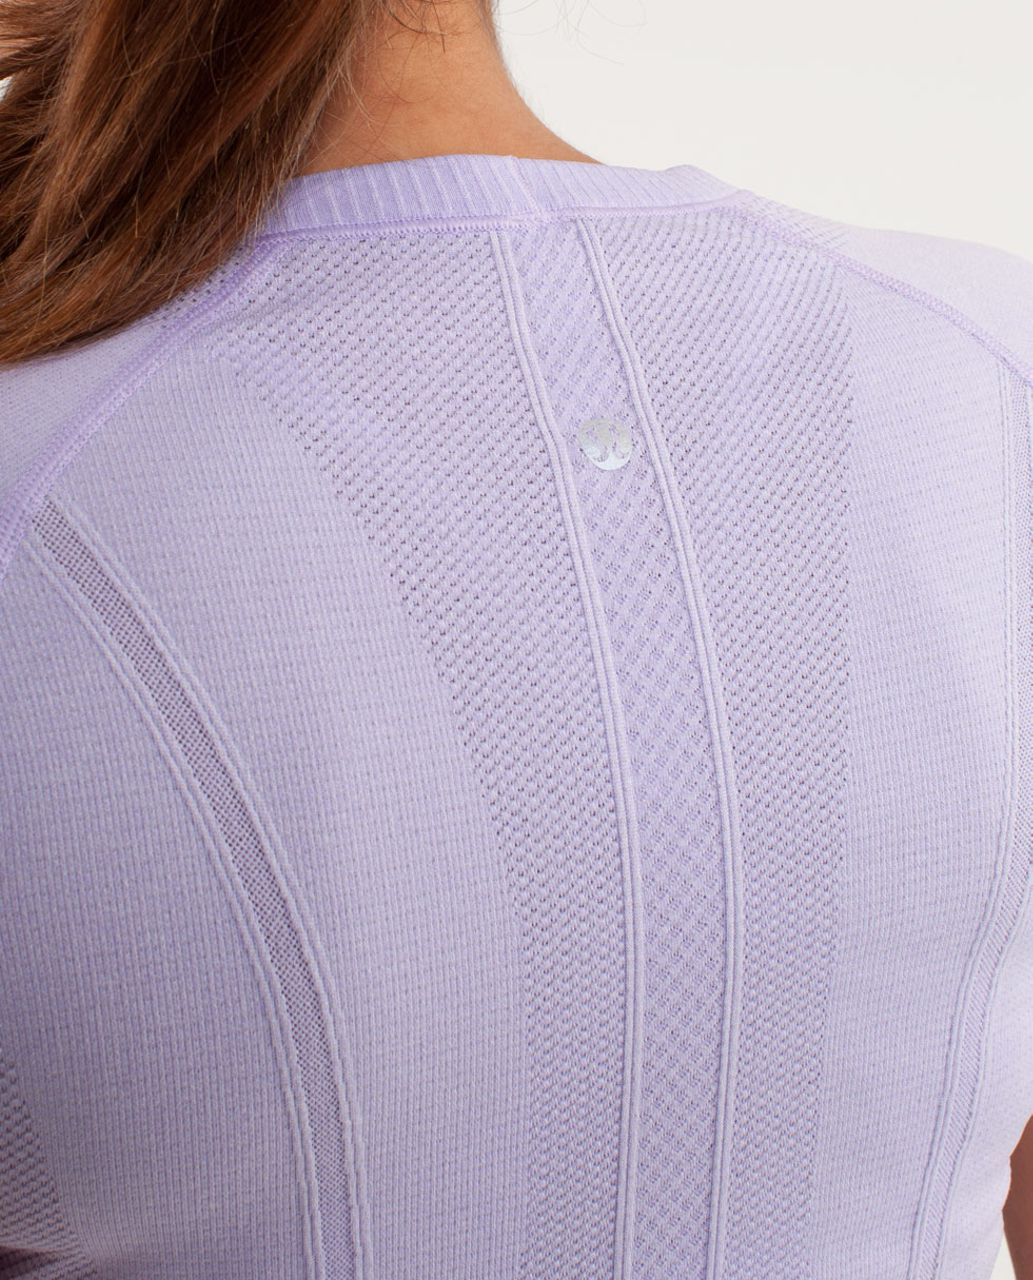 Lululemon Run:  Swiftly Tech Short Sleeve - Lilac